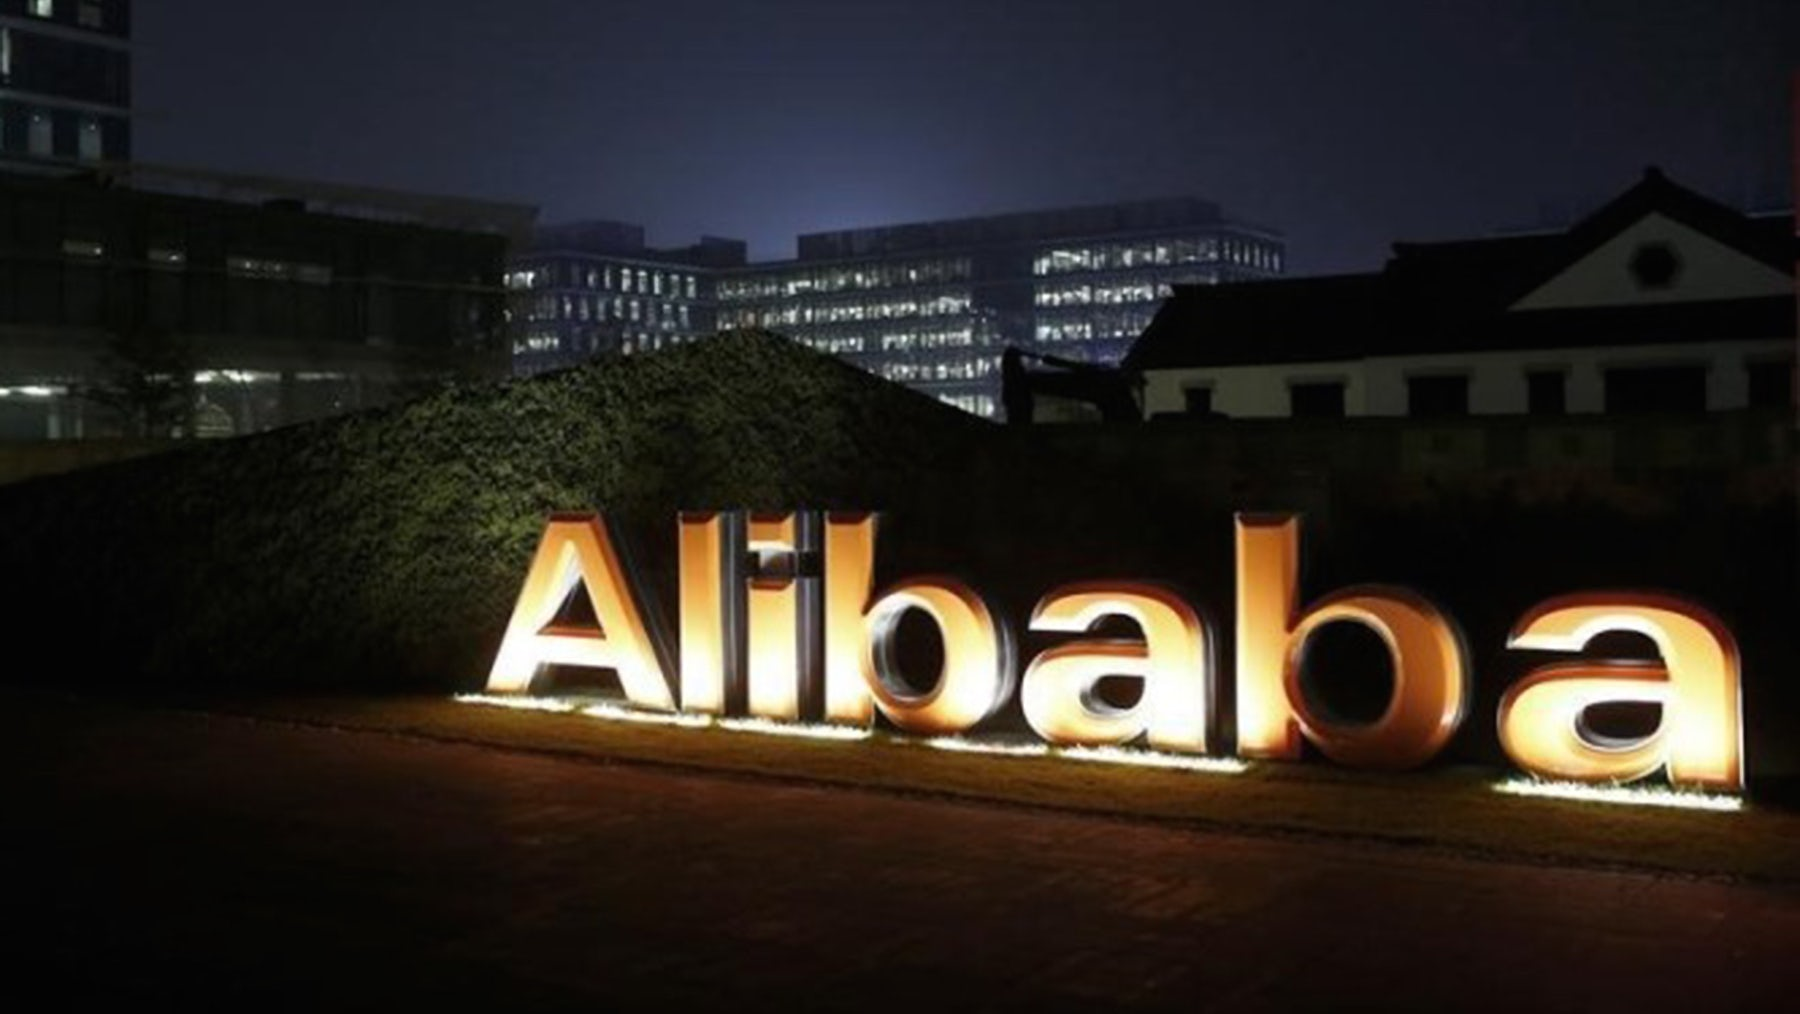 Alibaba headquarters in Hangzhou, China | Source: Reuters